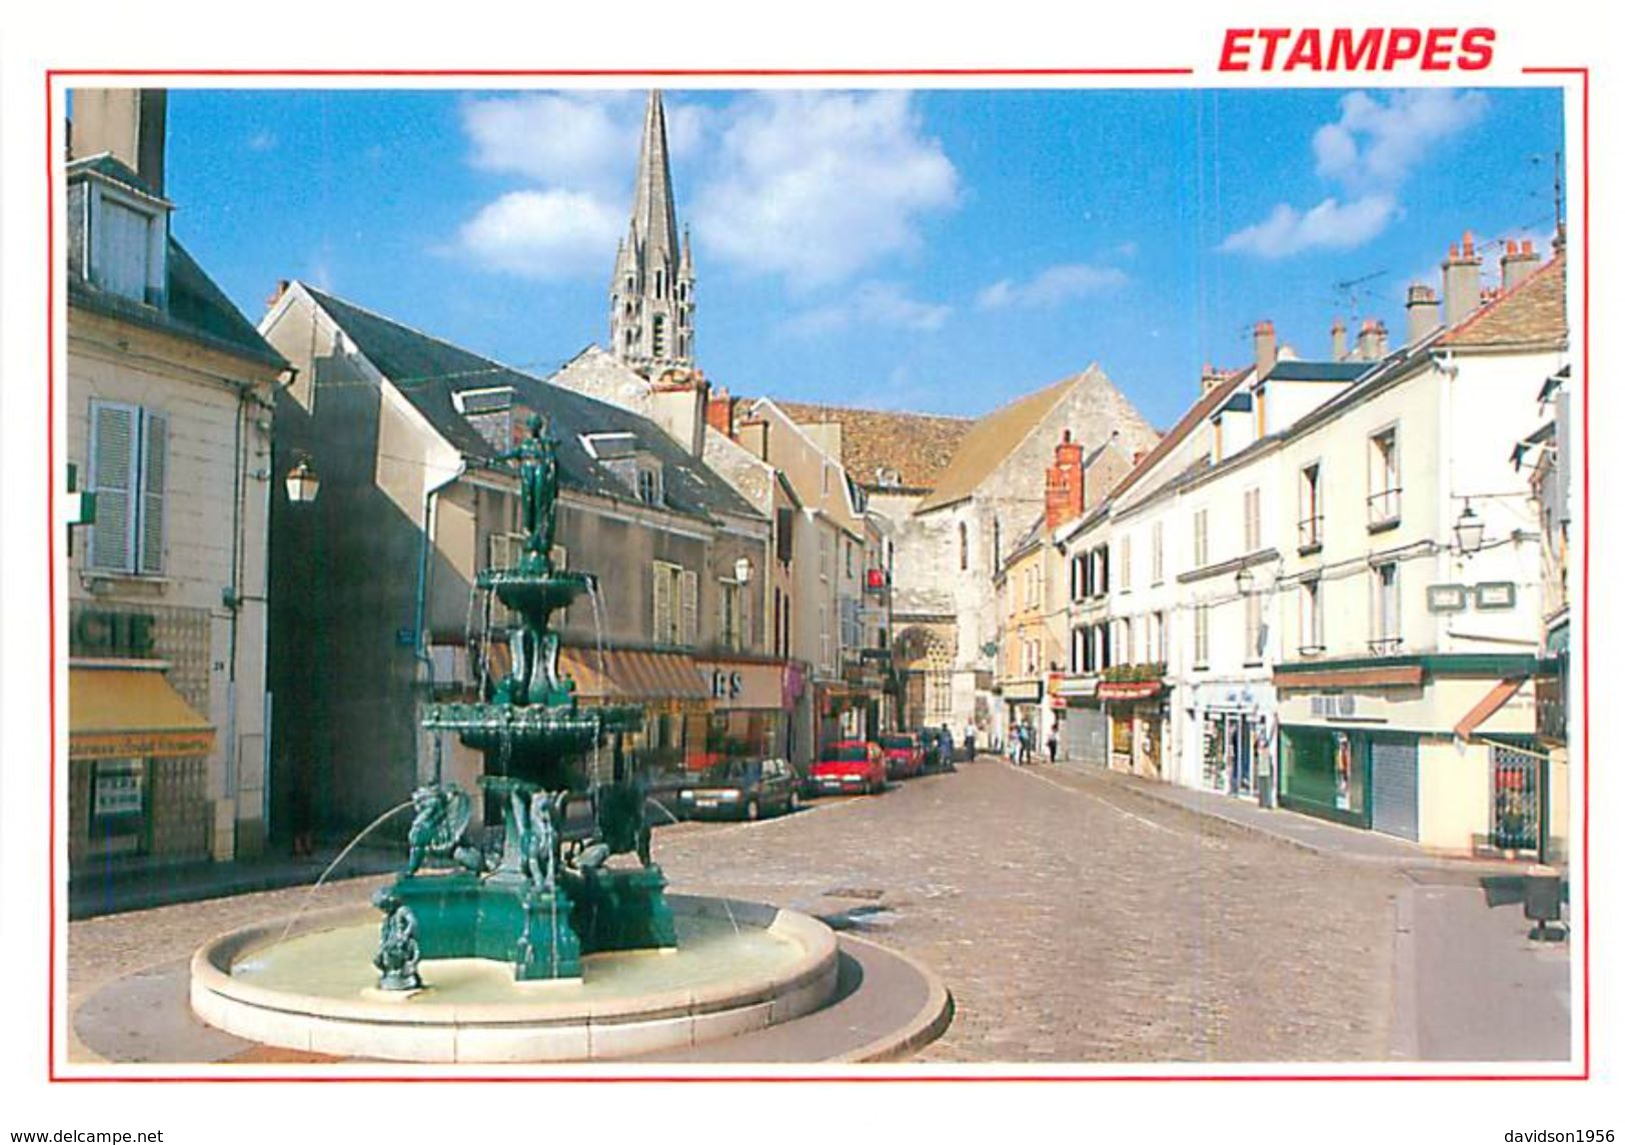 Cpsm -     Etampes  - Place Notre Dame ,  La Fontaine      V237 - Etampes